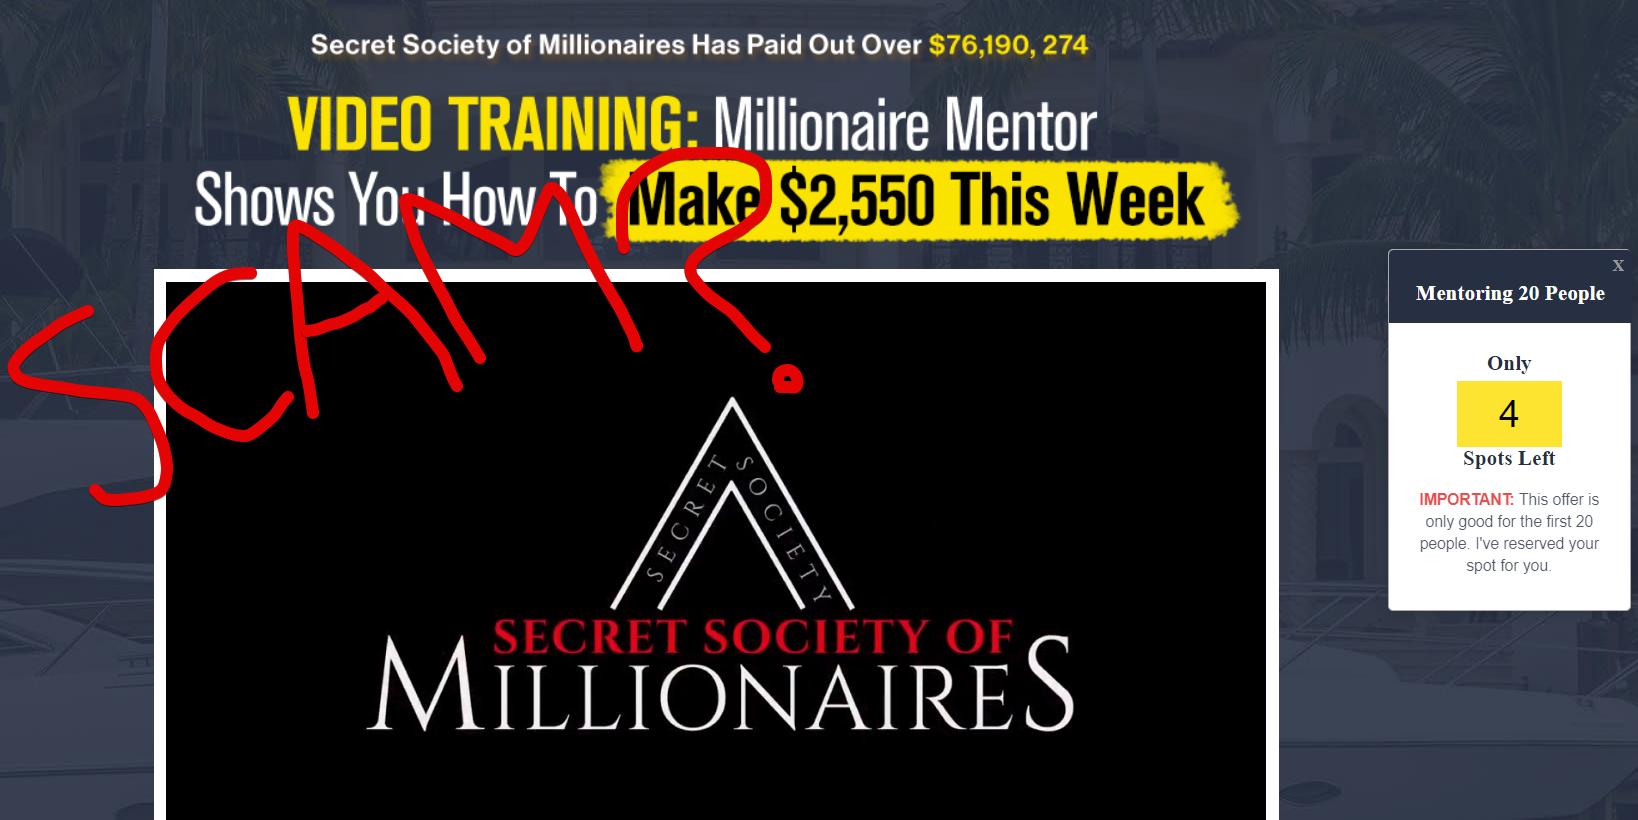 Secret Society of Millionaires